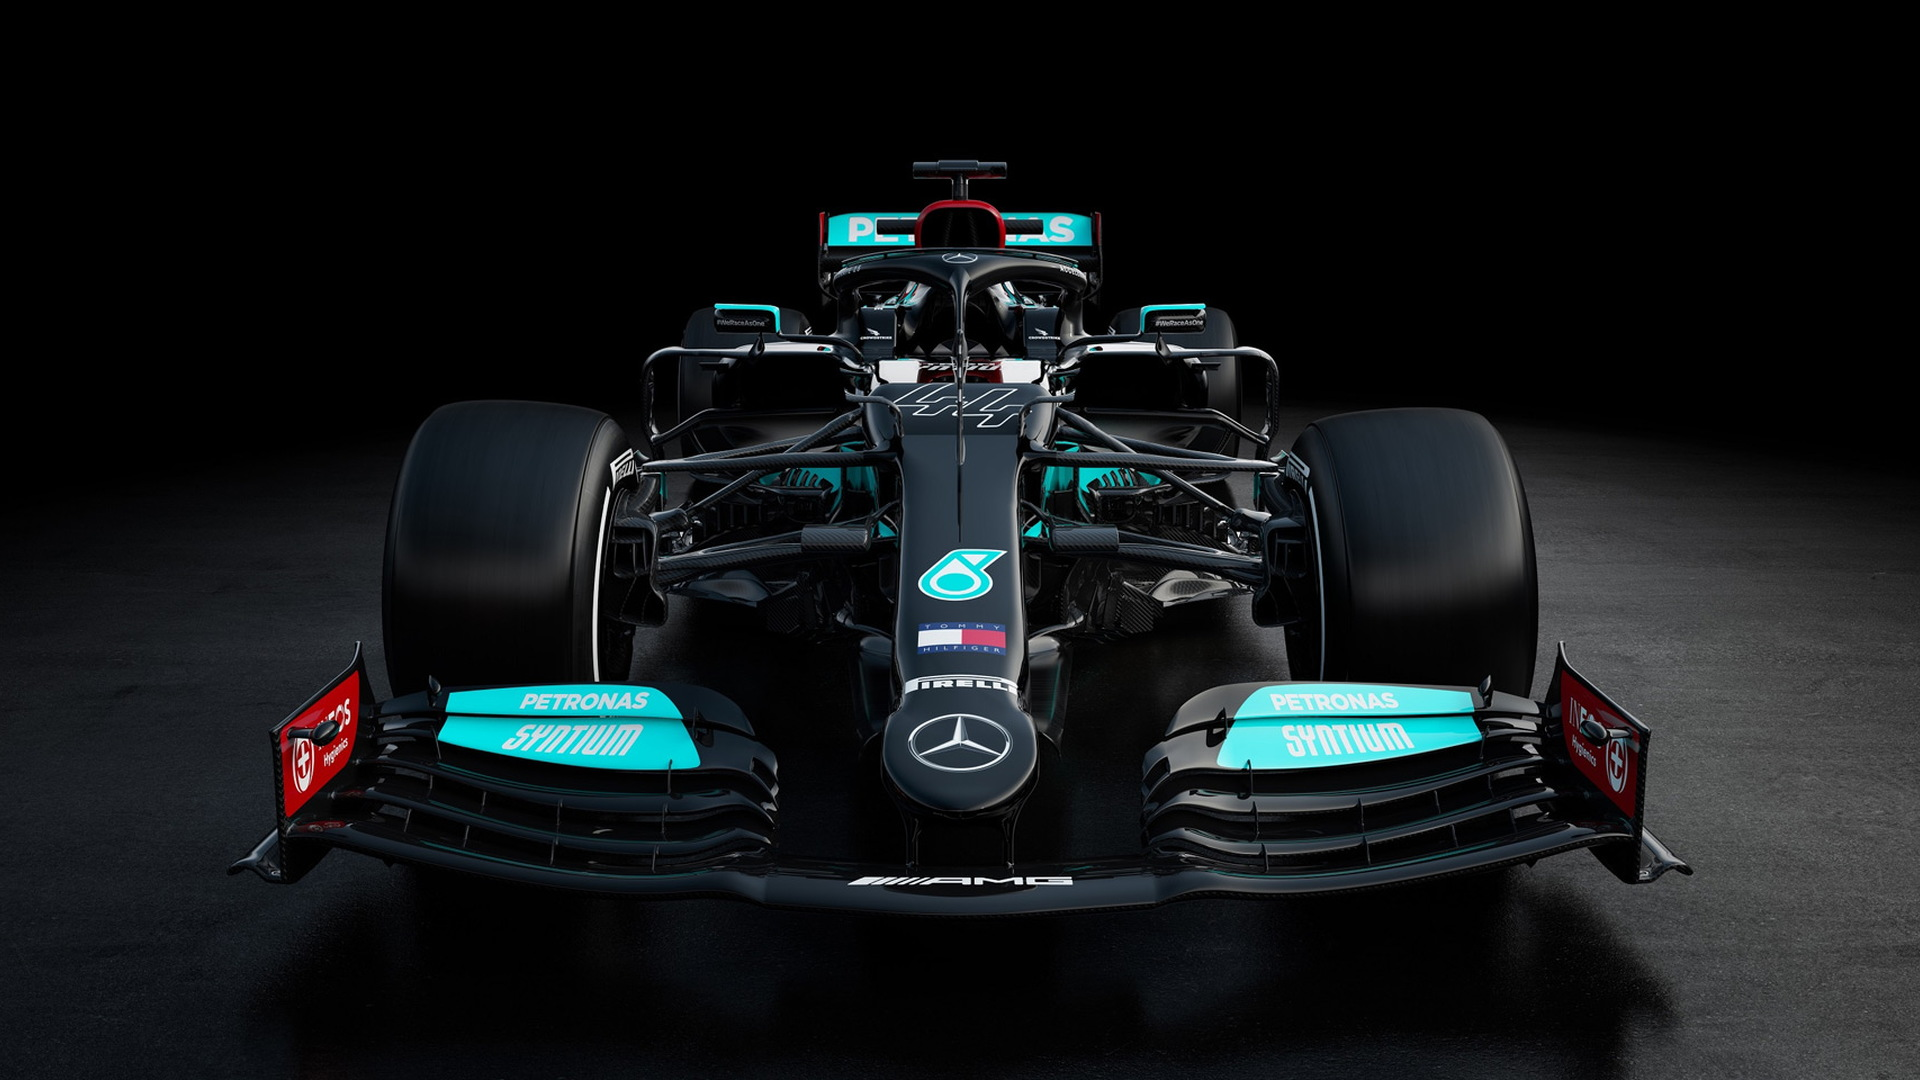 2021 Mercedes-Benz AMG W12 E Performance Formula One race car